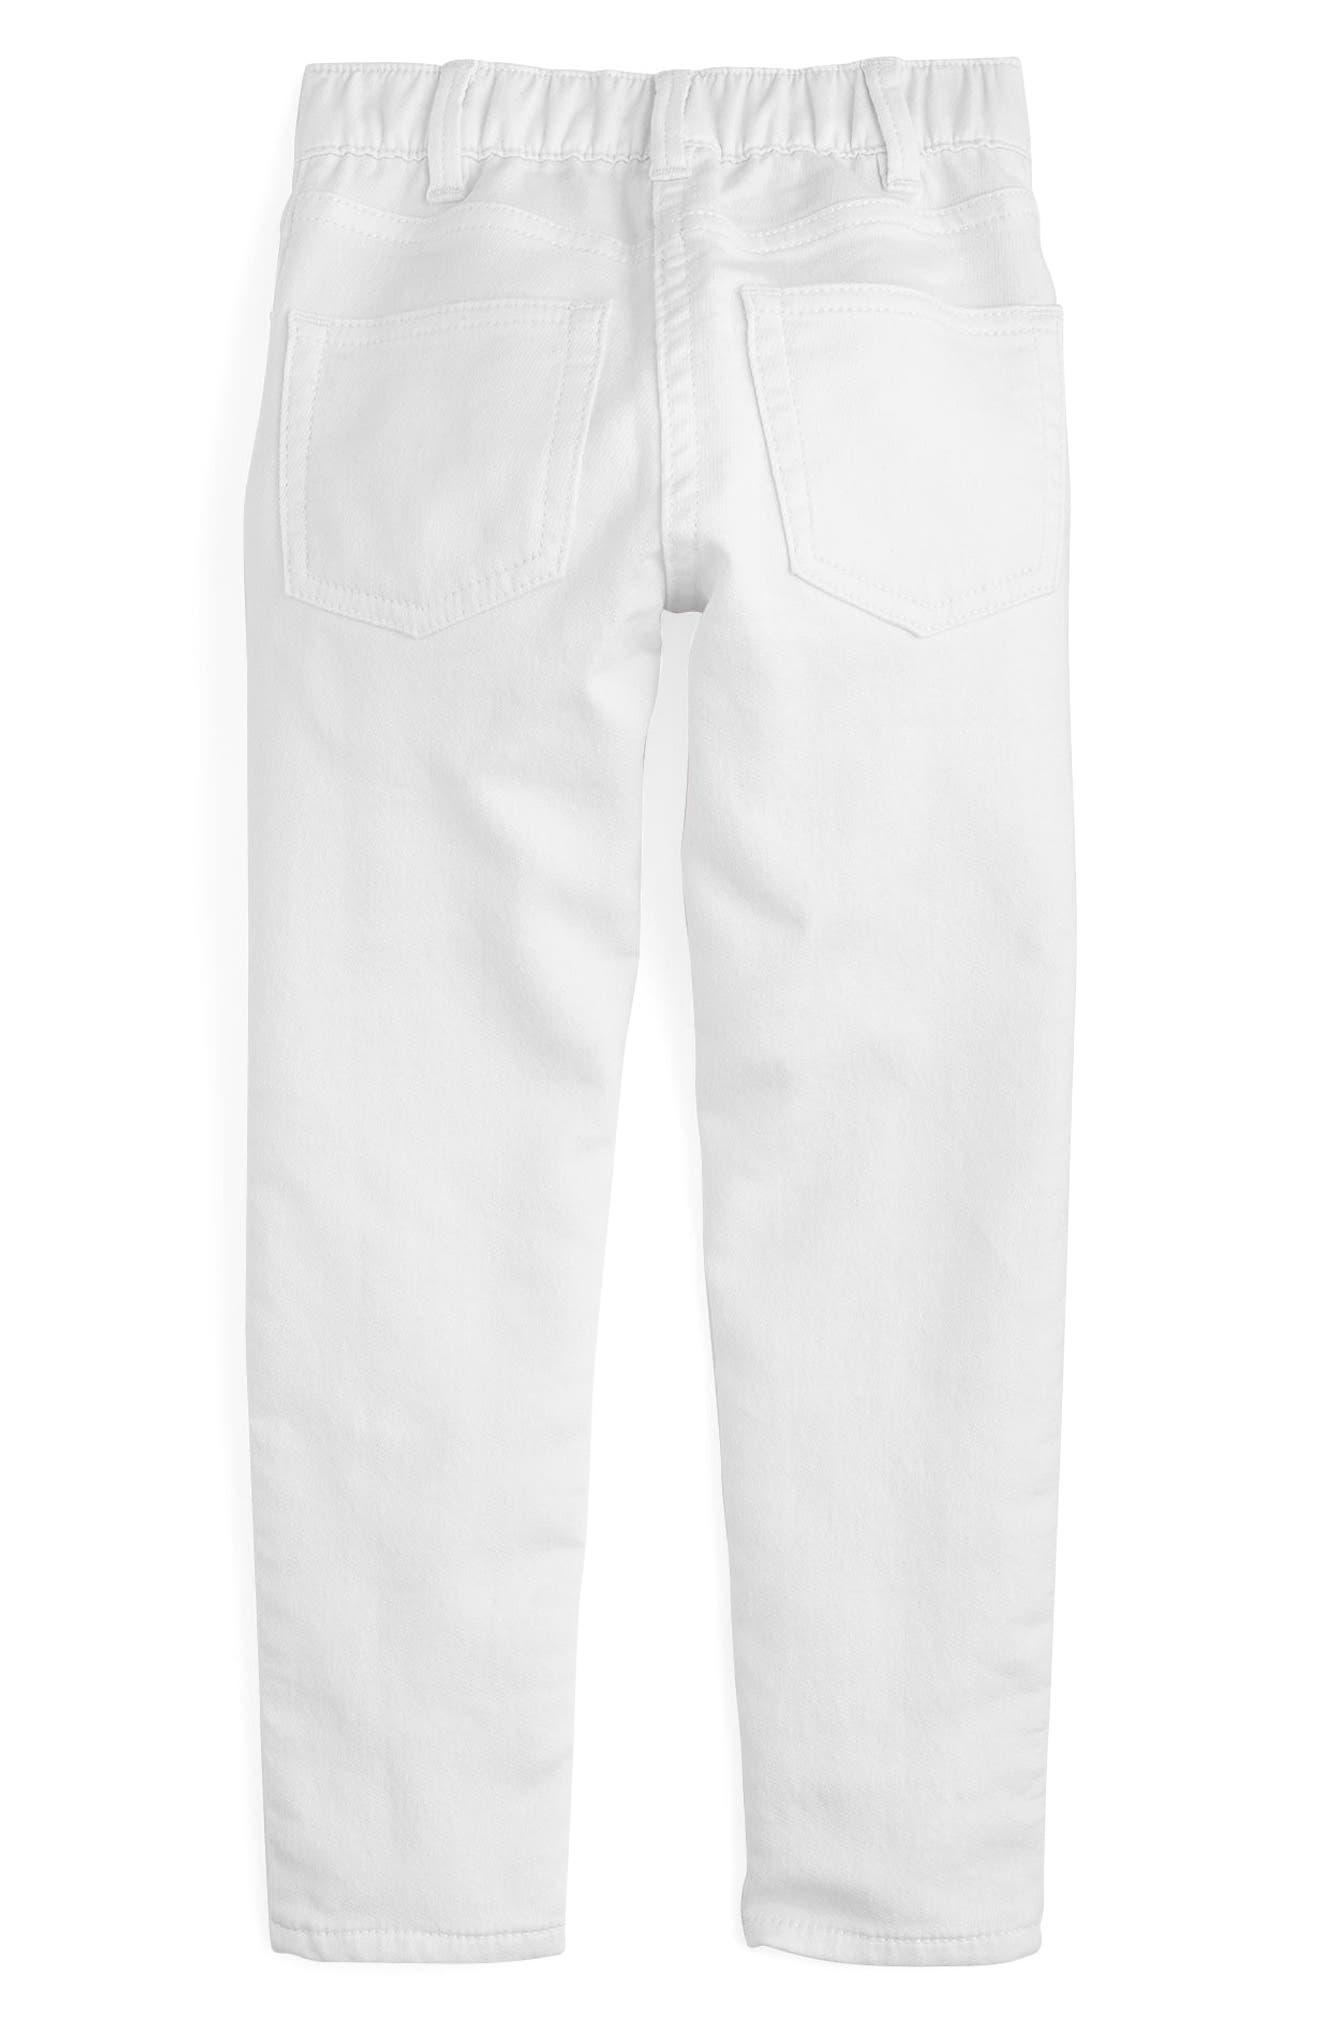 CREWCUTS BY J.CREW,                             Runaround Garment Dye Jeans,                             Alternate thumbnail 2, color,                             101